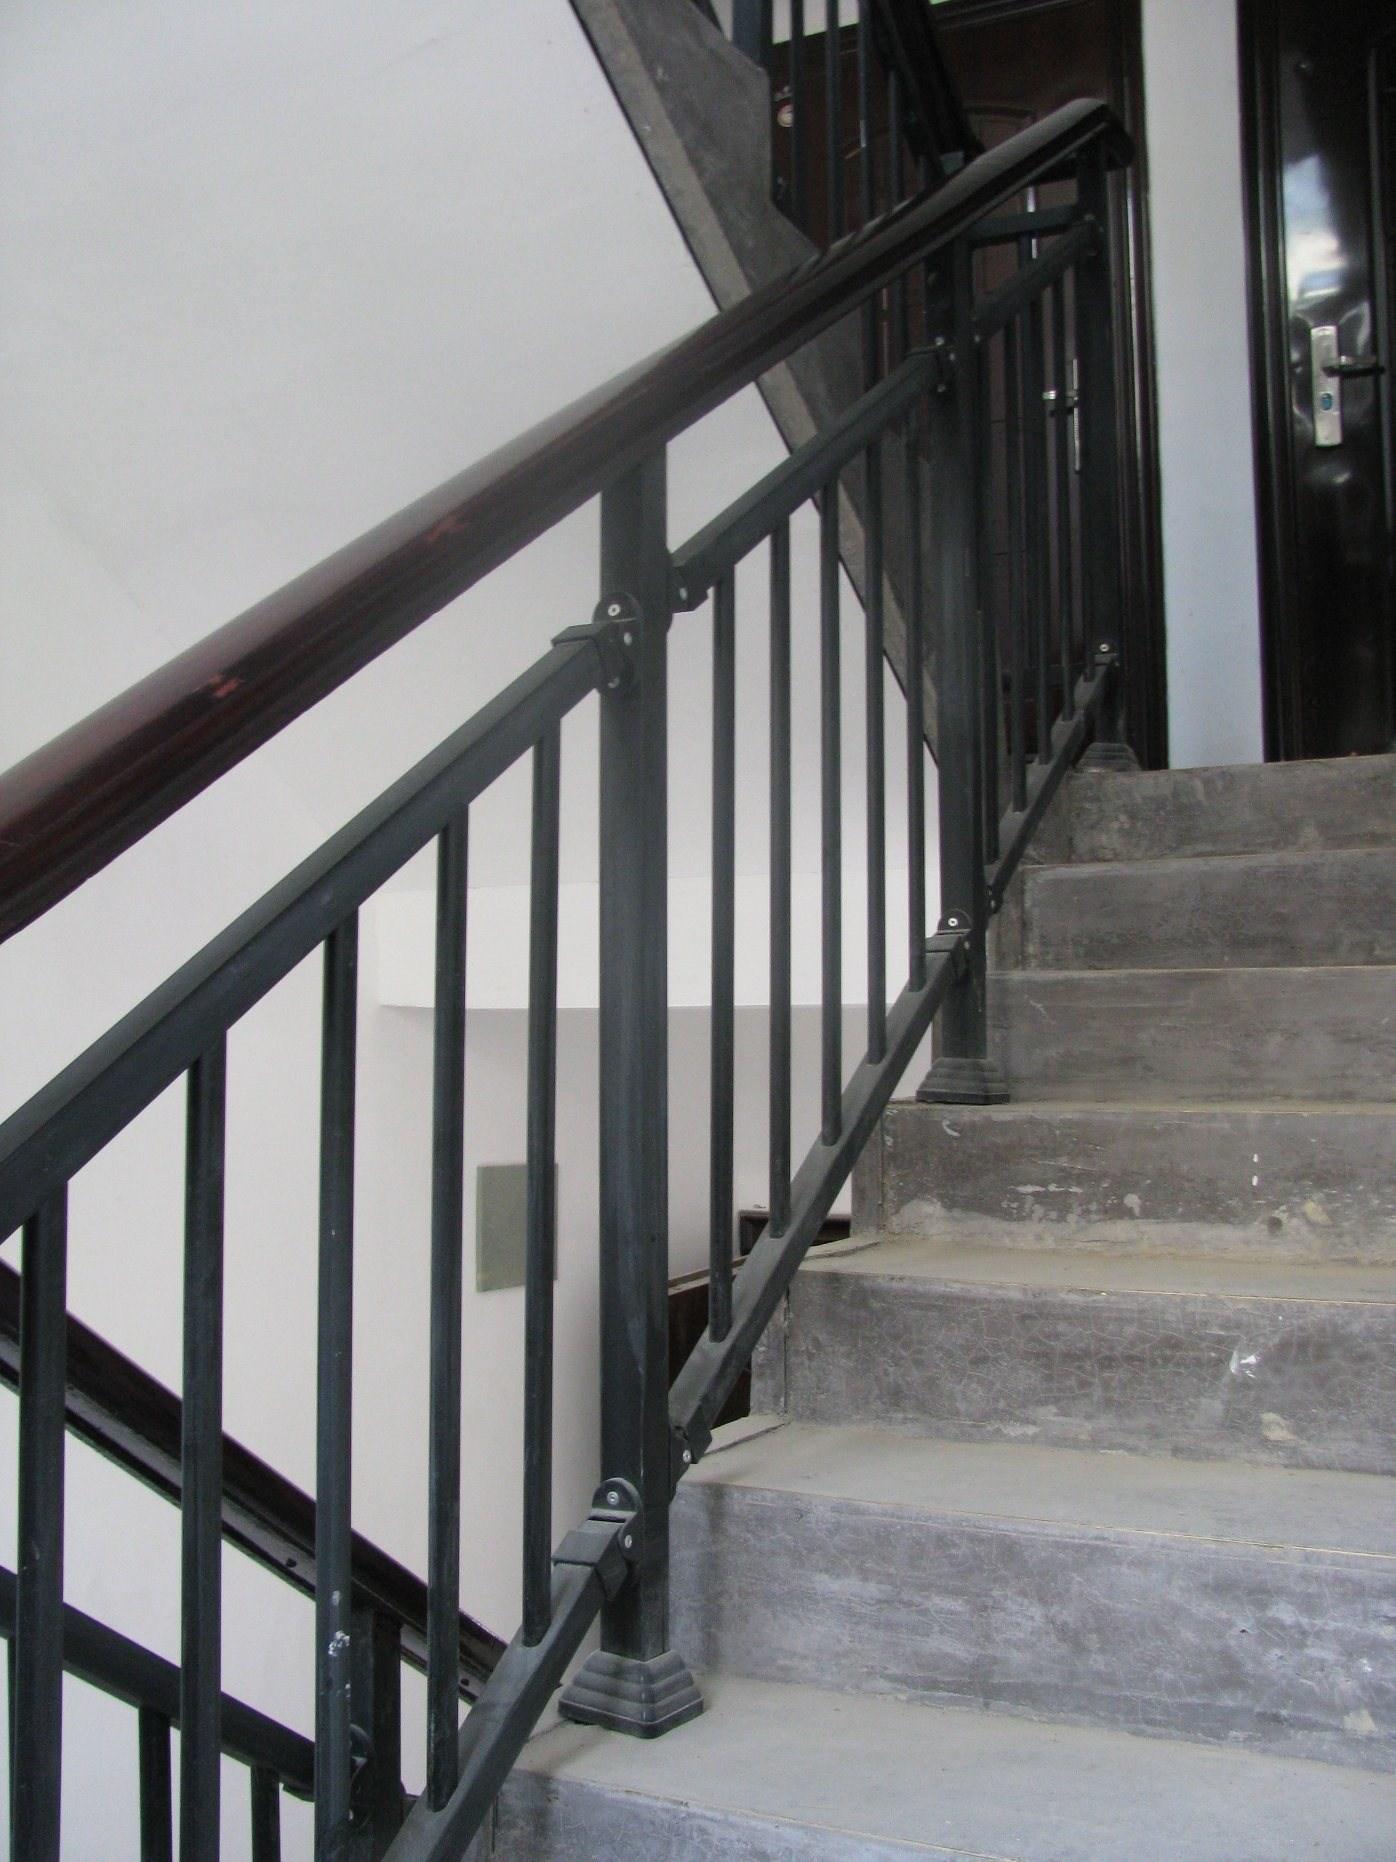 China Black Wrought Iron Stair Railing For Residential Building | Black Wrought Iron Stair Railing | Oak And Iron | Straight Line | Rectangular Iron | Walnut Iron | Steel Railing